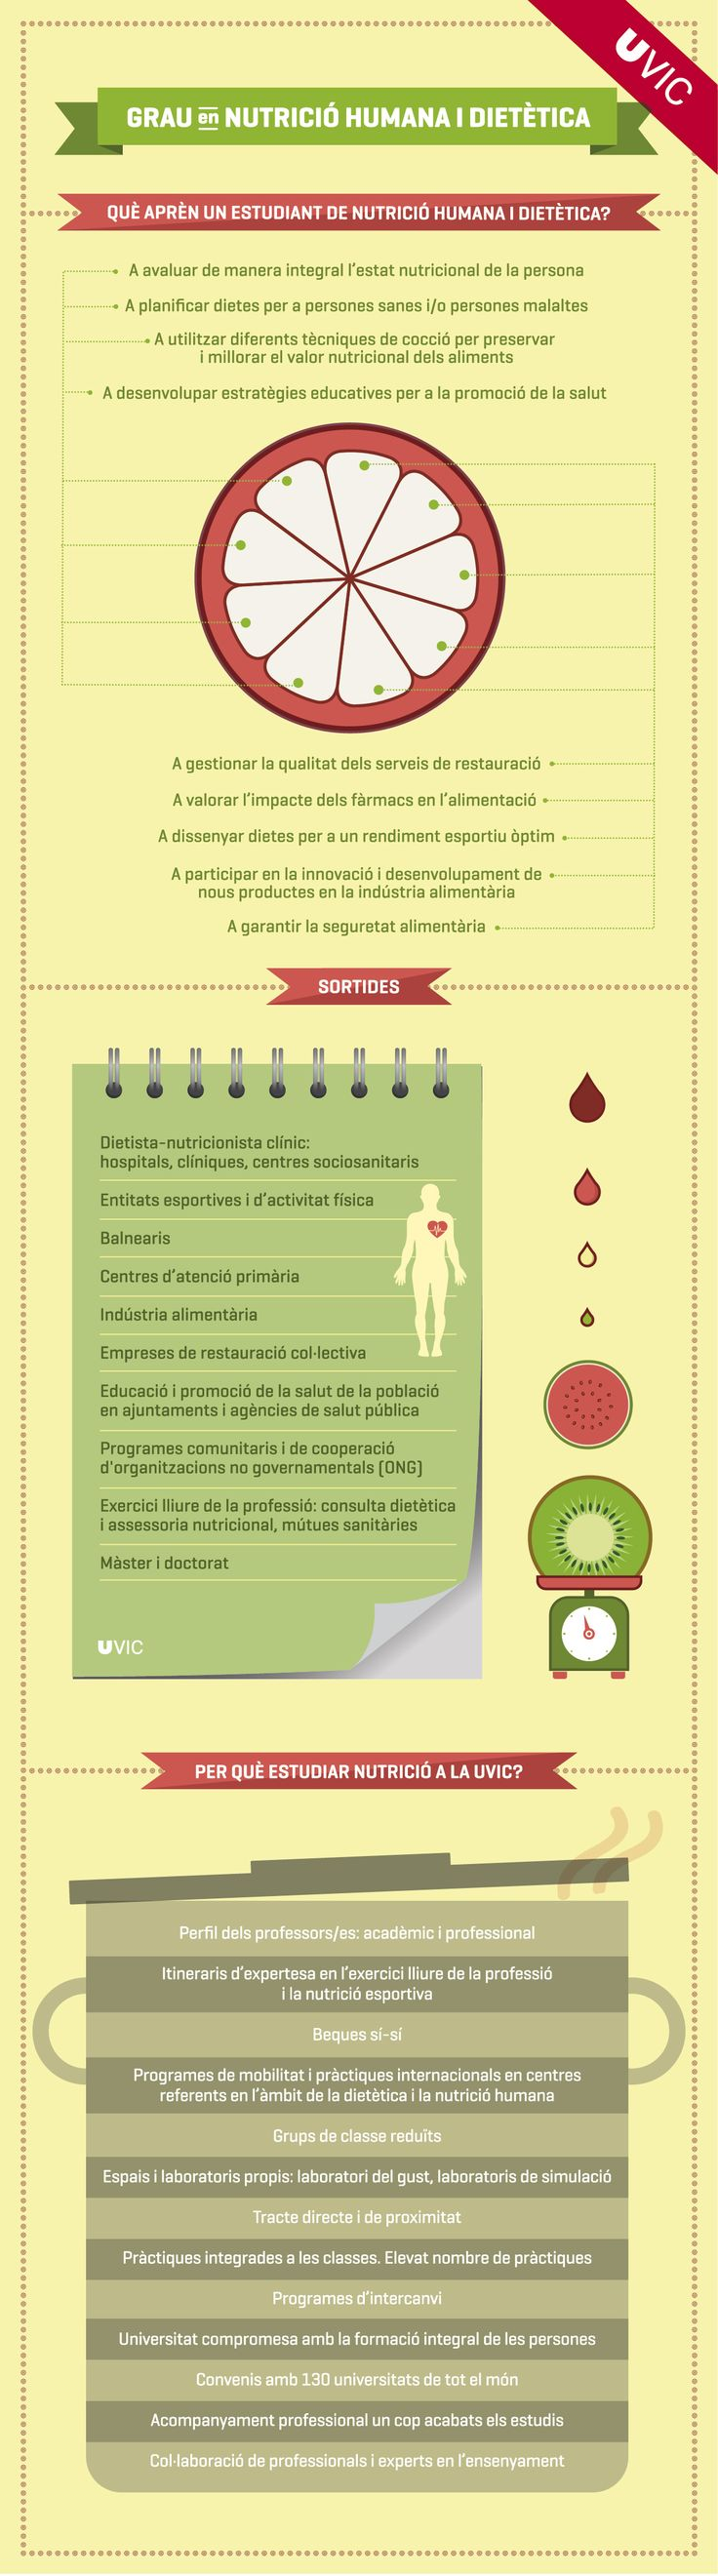 Infografia del Grau en Nutrició Humana i Dietètica. #grau #graus #Nutrició #Dietètica #infografia #estudis #universitat #uviclife #uvic #universitatdevic #salut